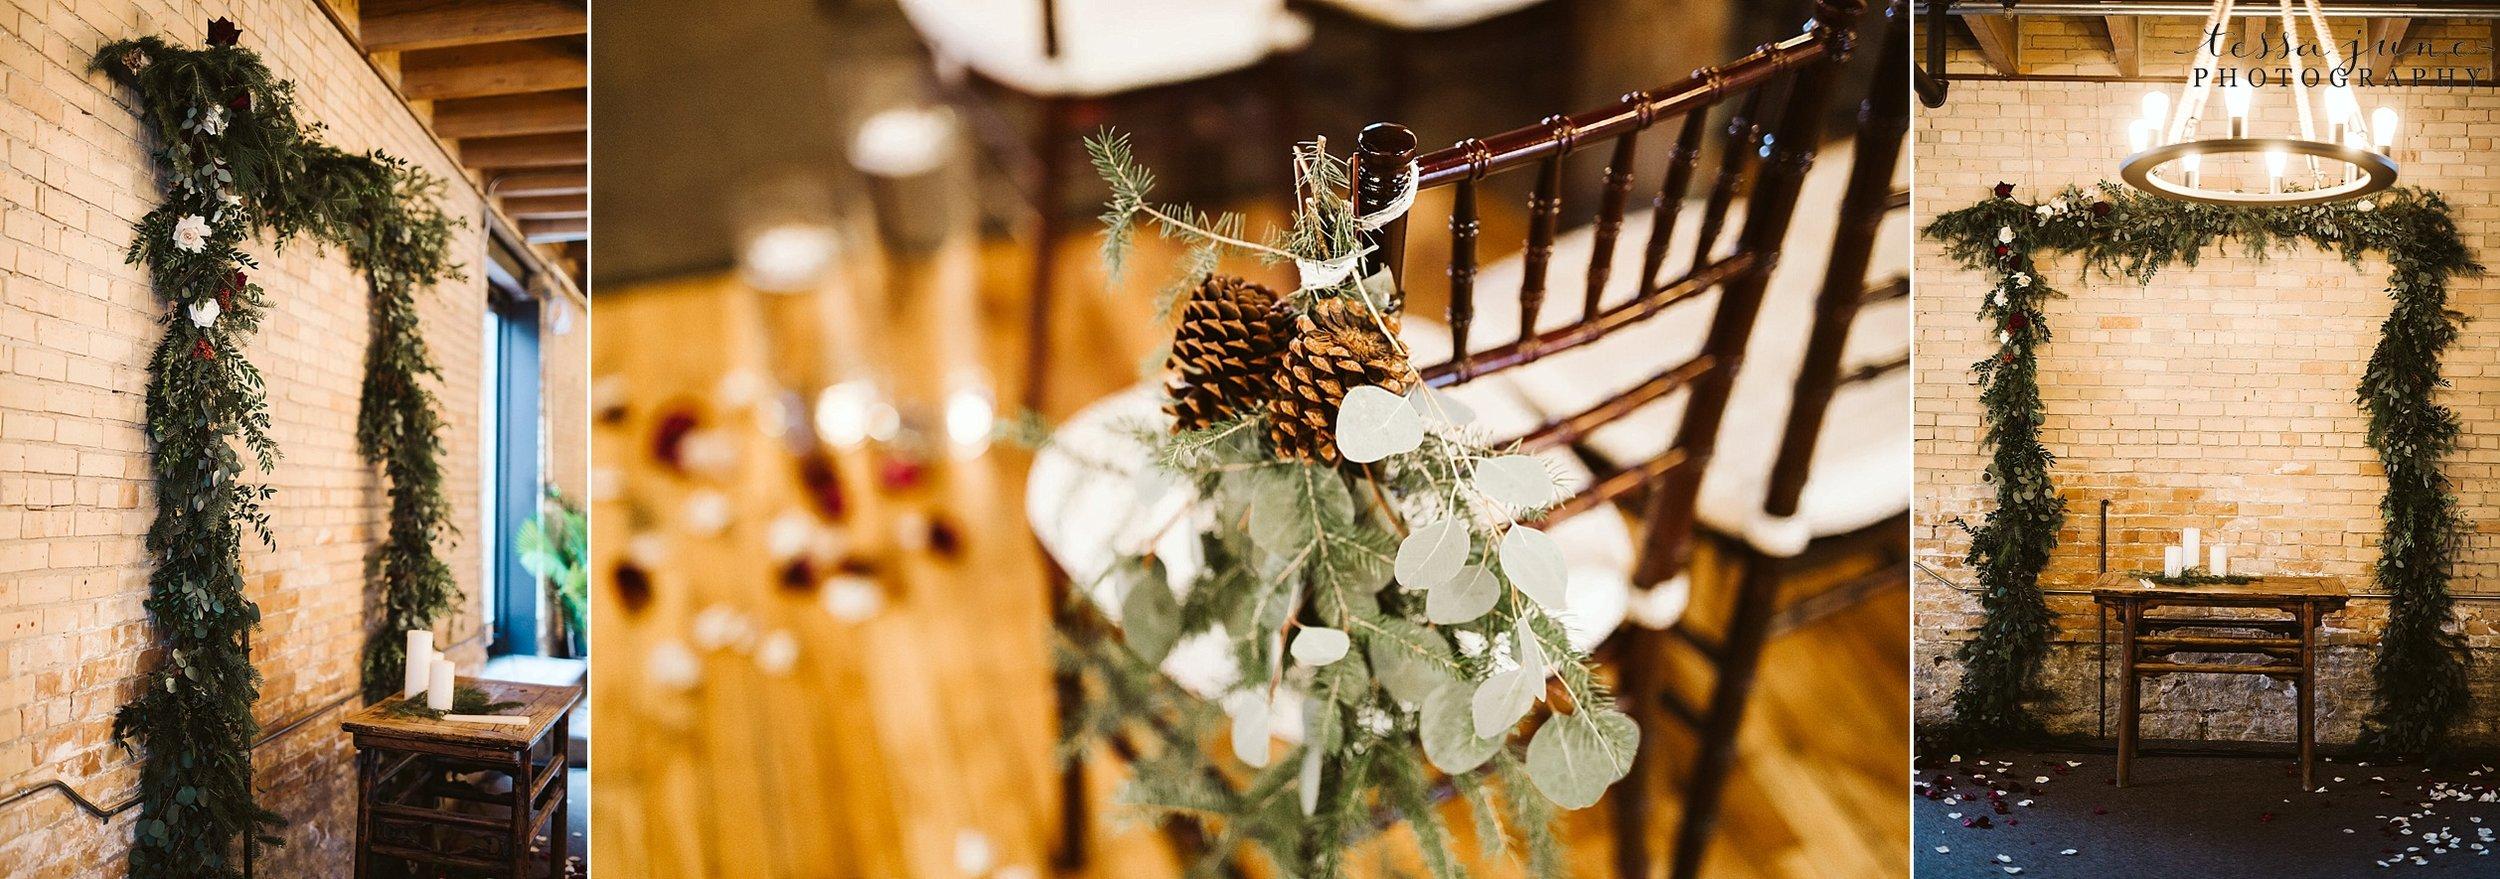 minneapolis-event-center-winter-romantic-snow-wedding-december-131.jpg